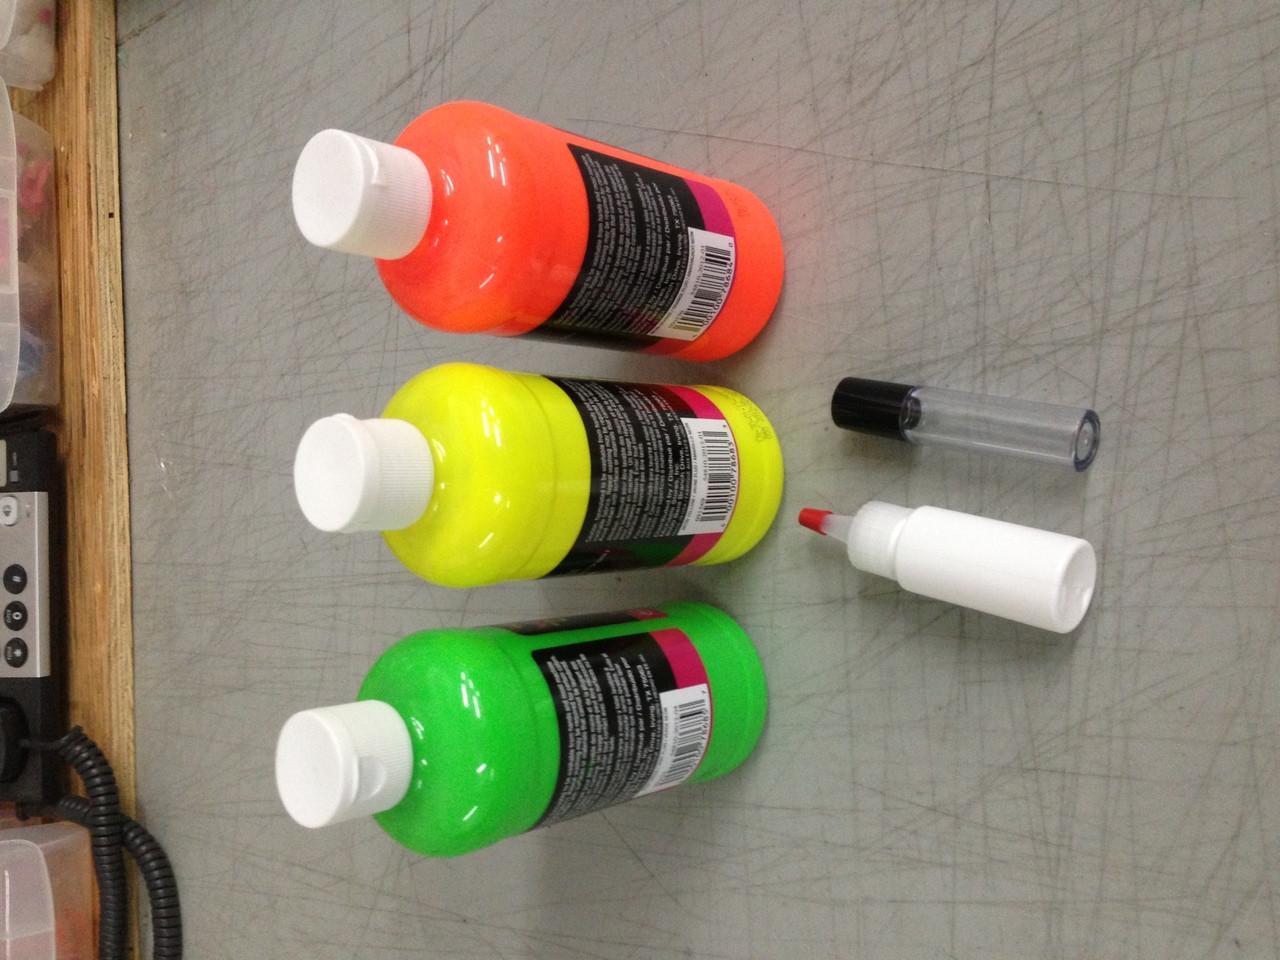 glow,Paint,GLOW PAINT,Glow Party,nightclub,Paint,pintura,UV, Uv Reactive, NightlcubShop , supply,supplies,bulk,wholesale